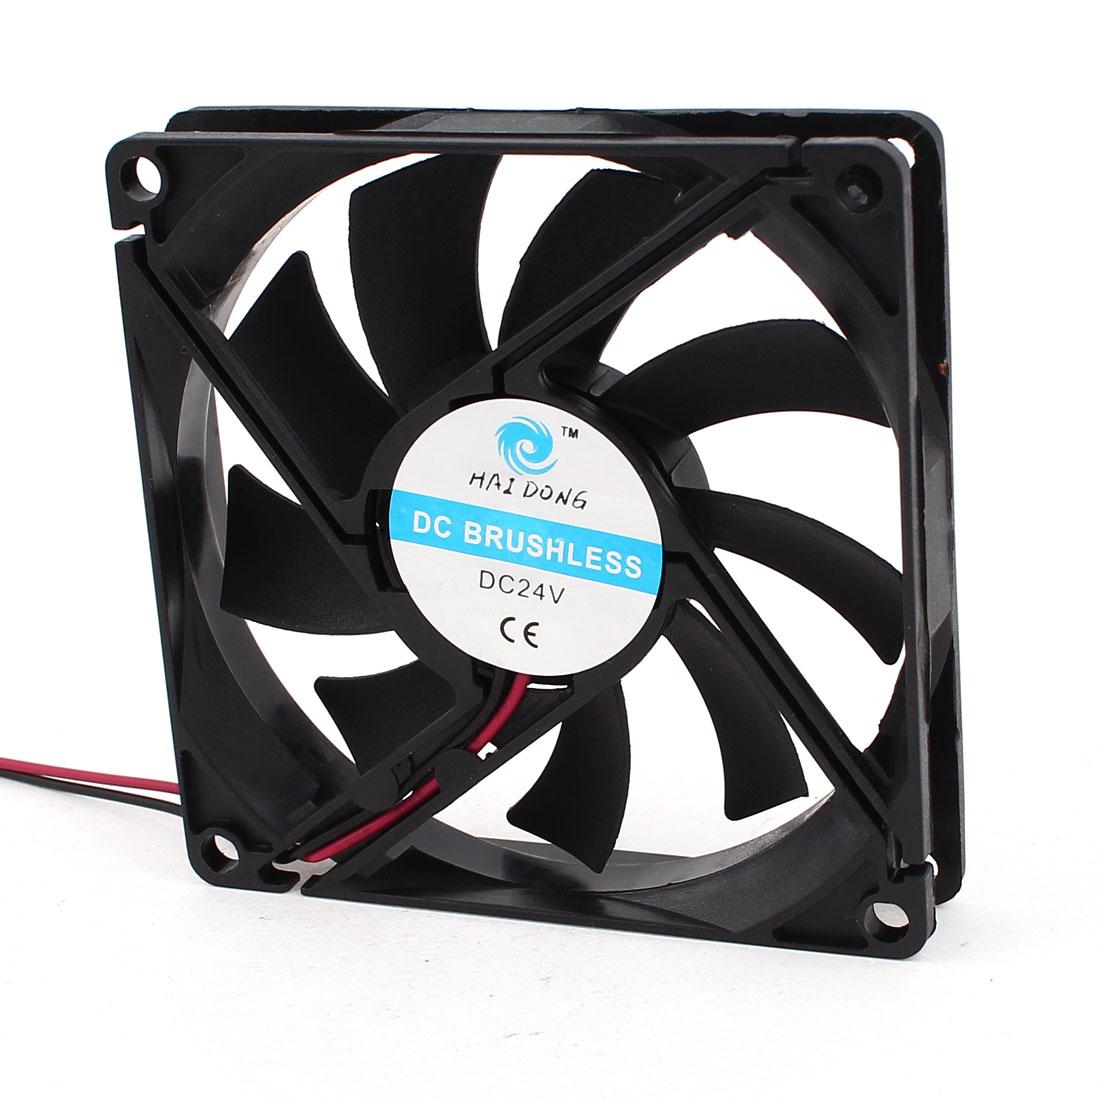 80mm x 15mm 8015 Brushless Cooling Fan DC 24V for Computer Case CPU Cooler